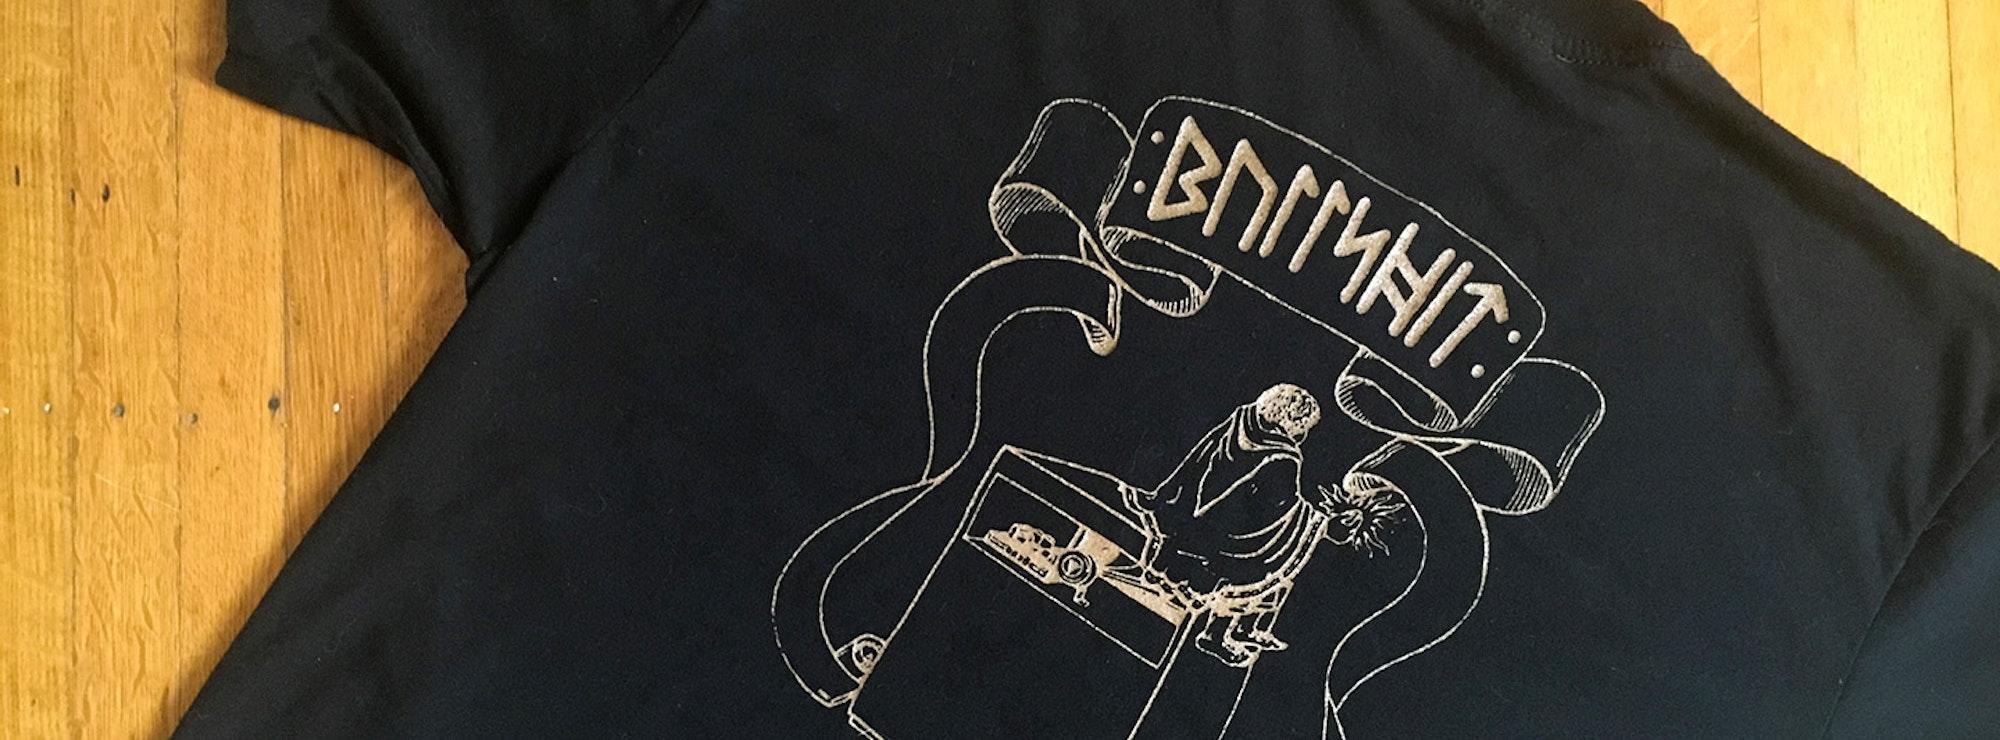 Klipsch Hobbit Bullshit shirt